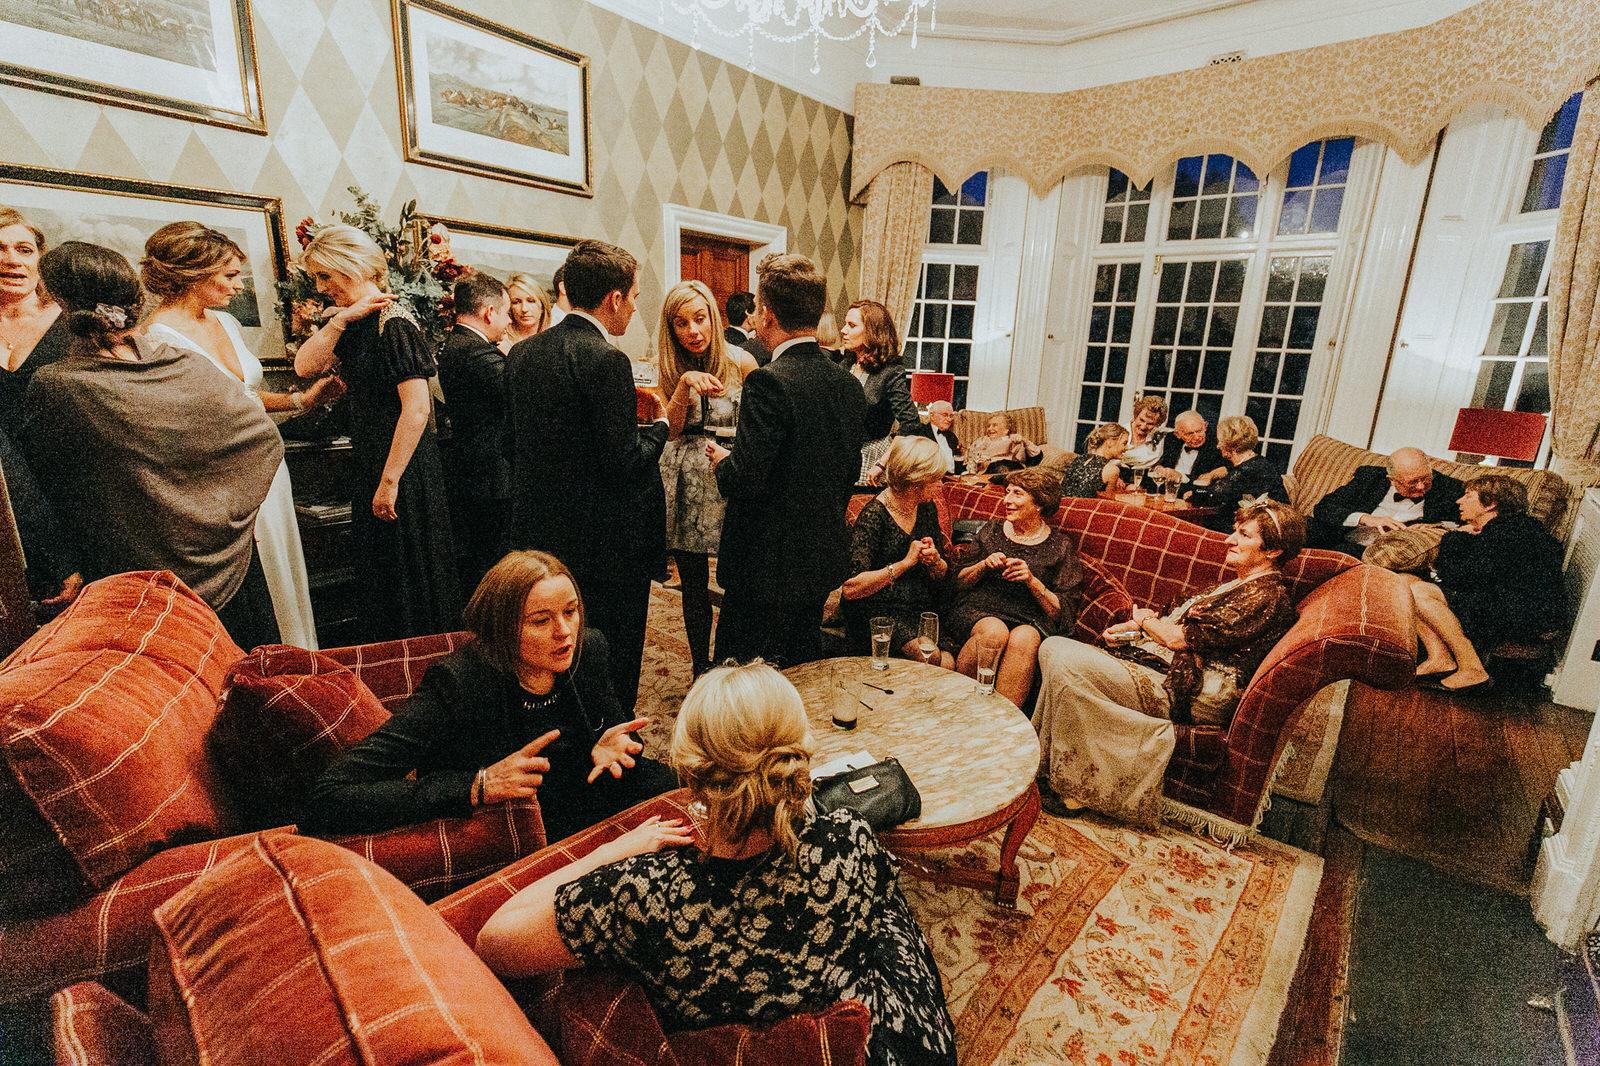 Dunbrody_House_Wedding_photographer_117.jpg